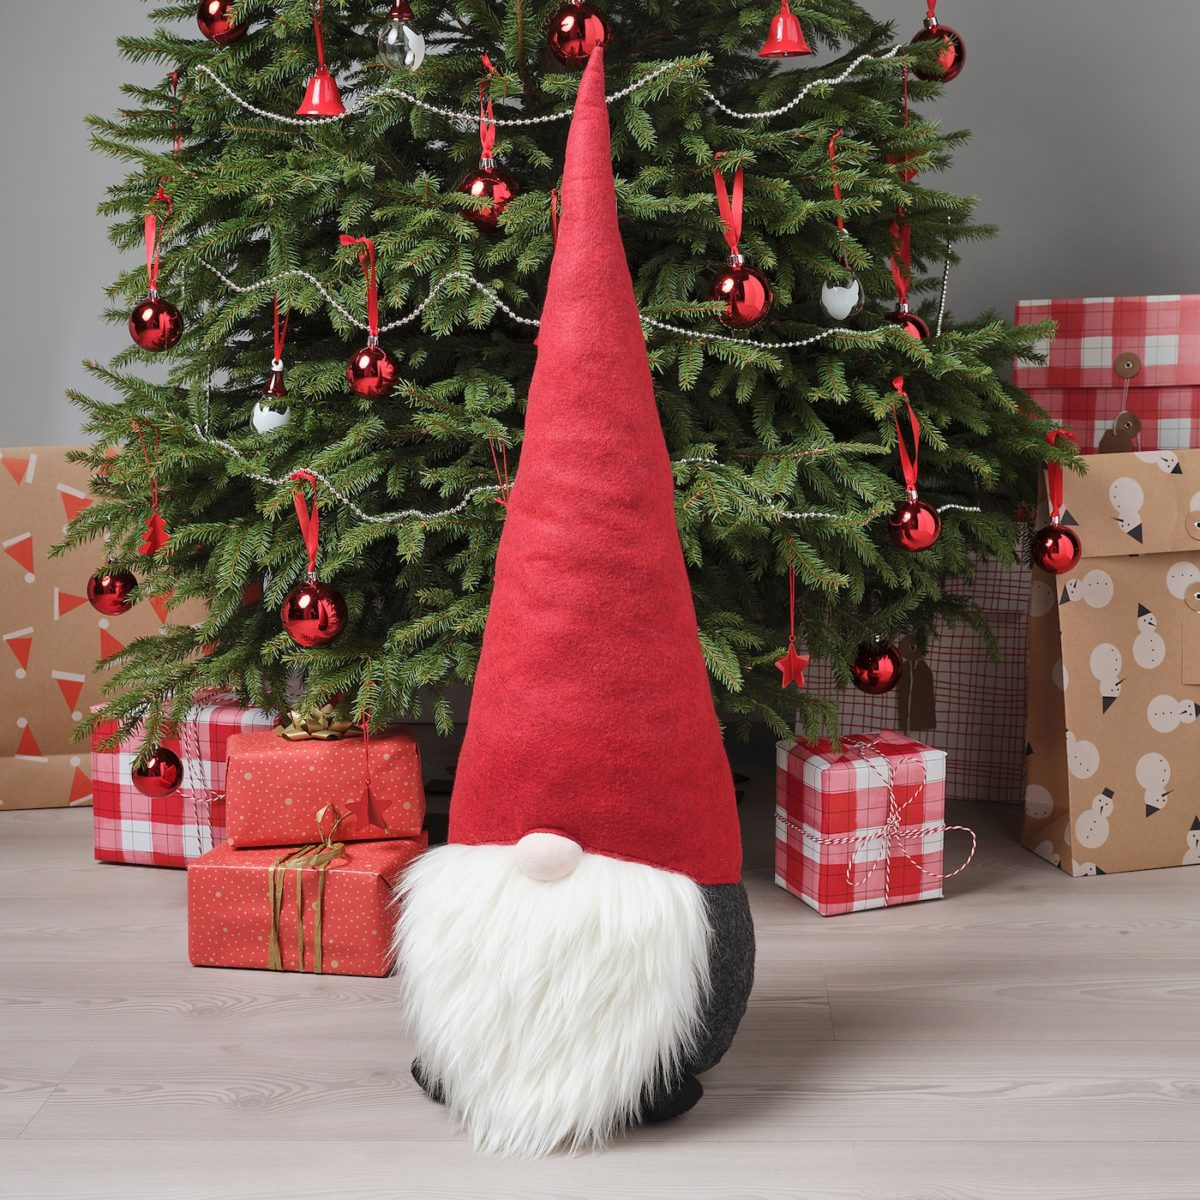 Addobbi Natalizi Ikea.Ikea Collezione Vinterfest Natale 2019